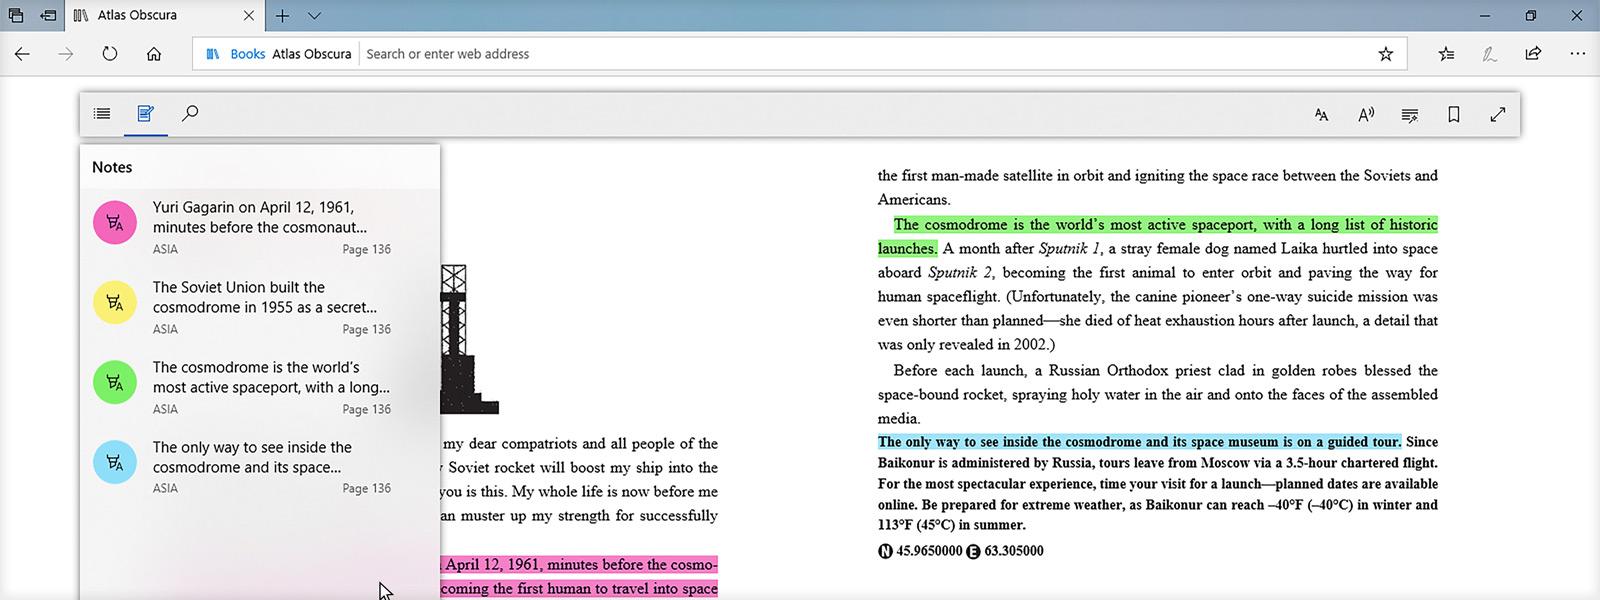 Microsoft Edge 내에서 책을 읽는 동안 텍스트가 강조 표시되어 있는 이미지